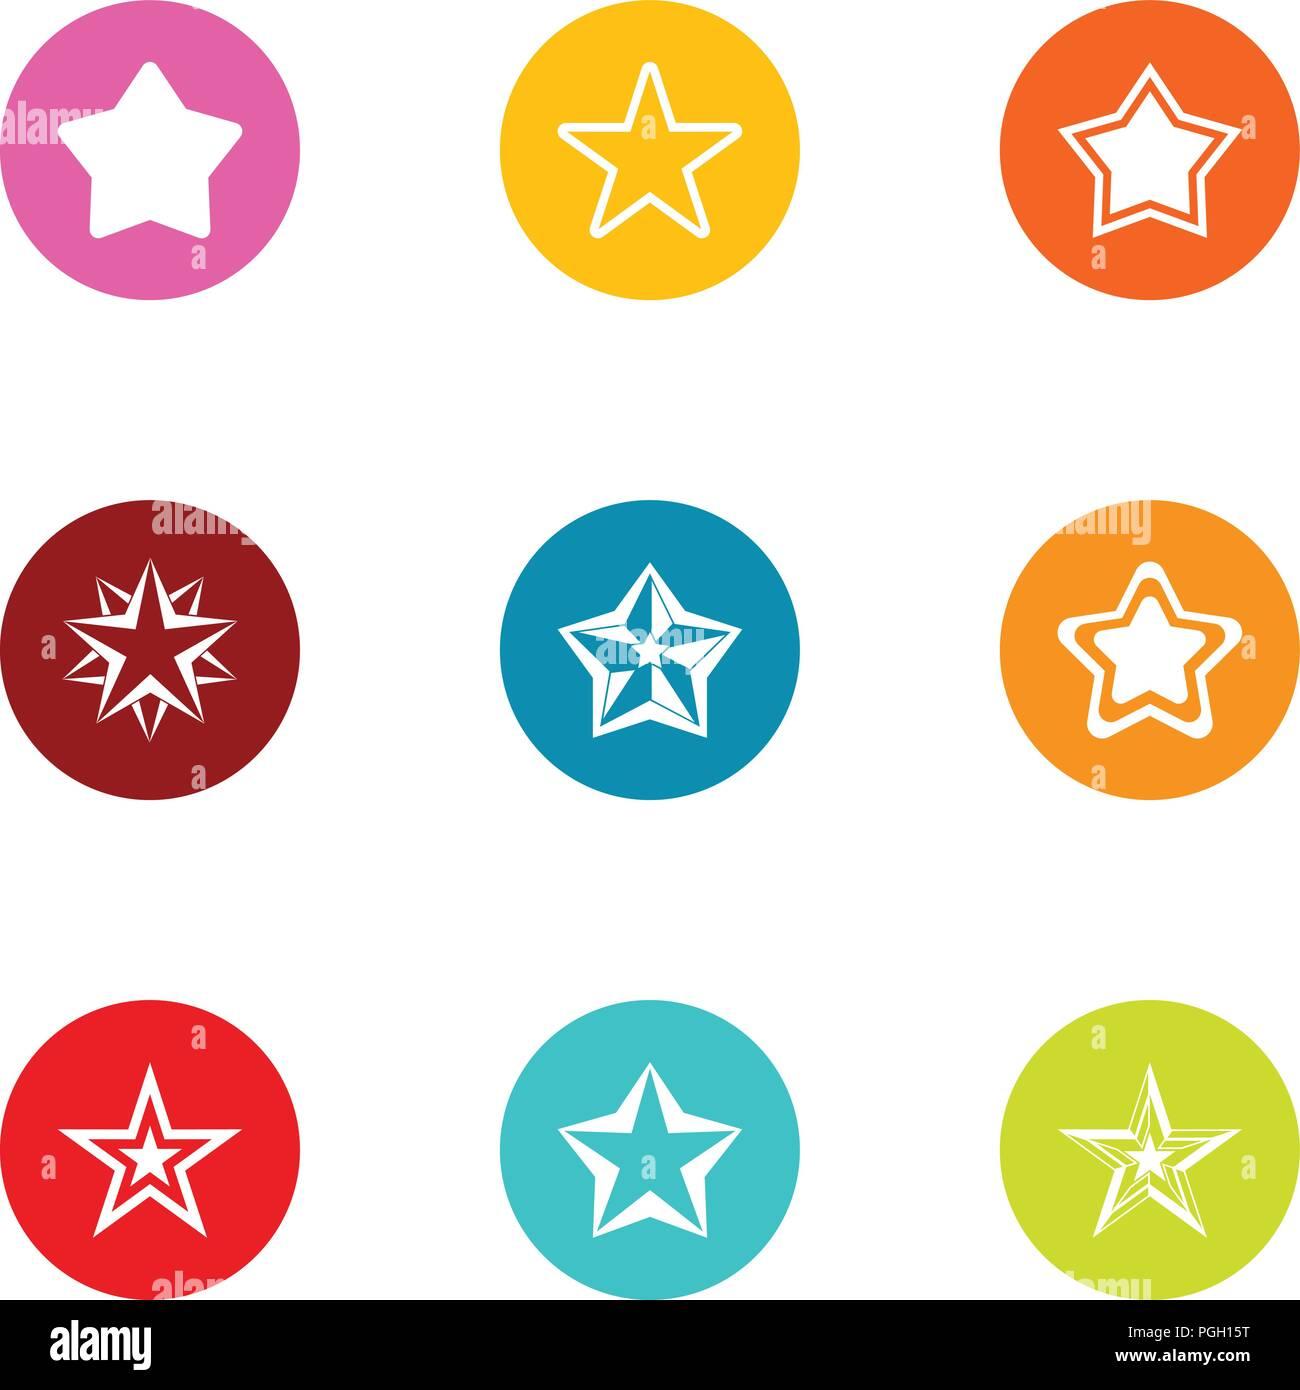 Stellar icons set, flat style - Stock Vector